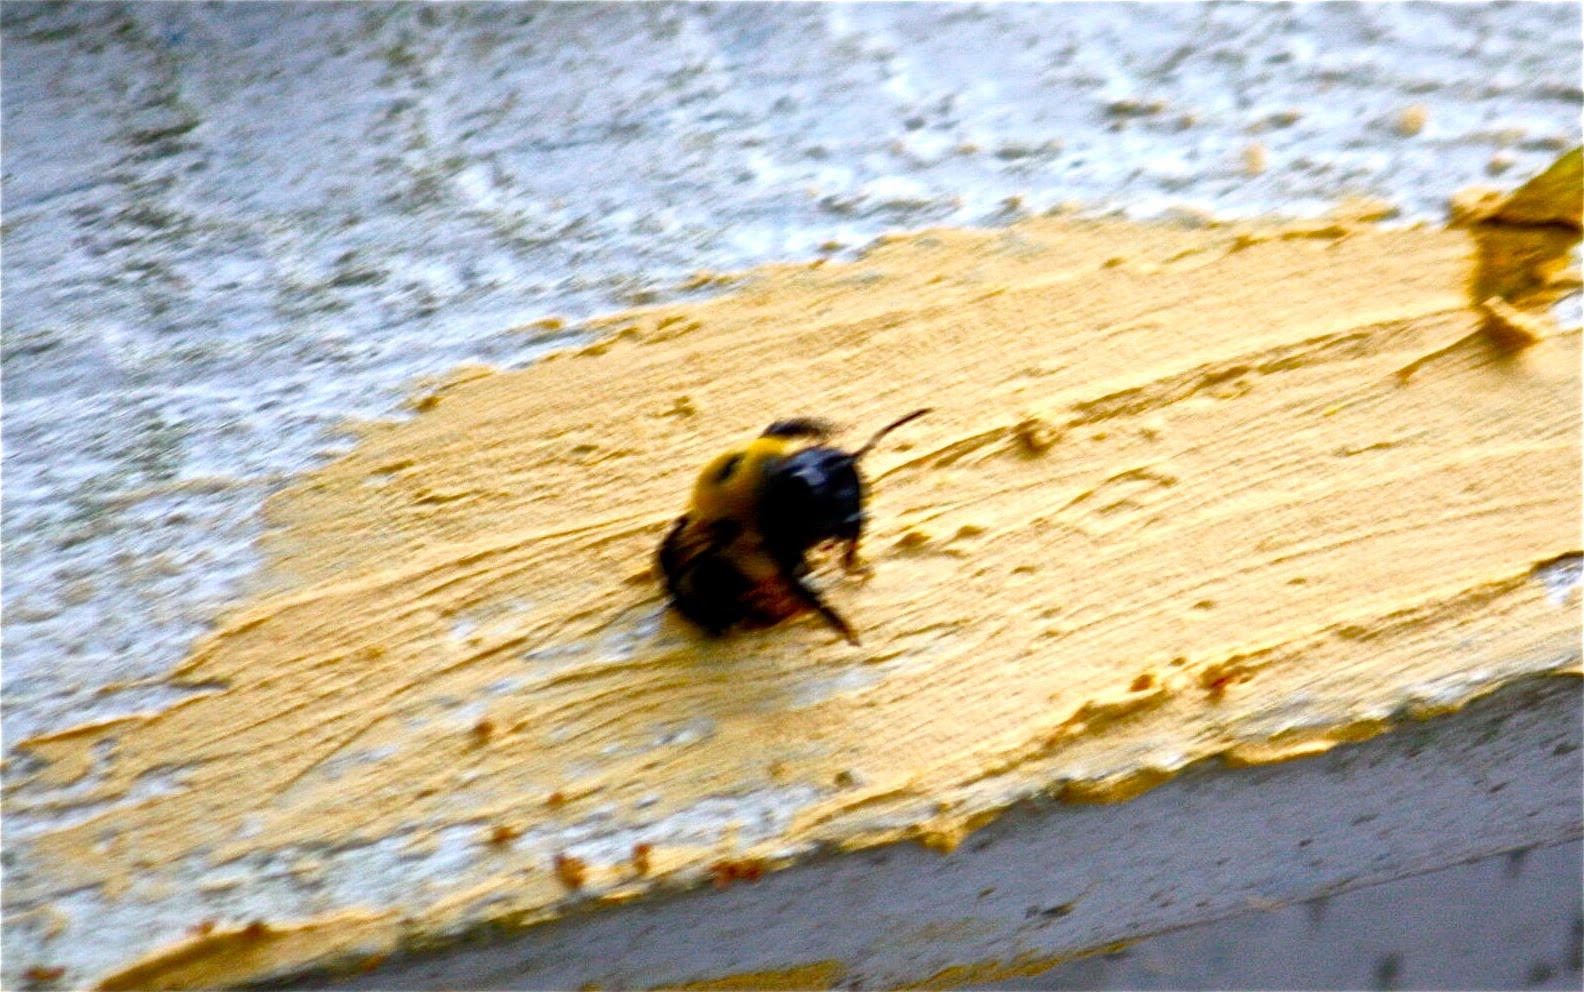 Carpenter bees - photo#52